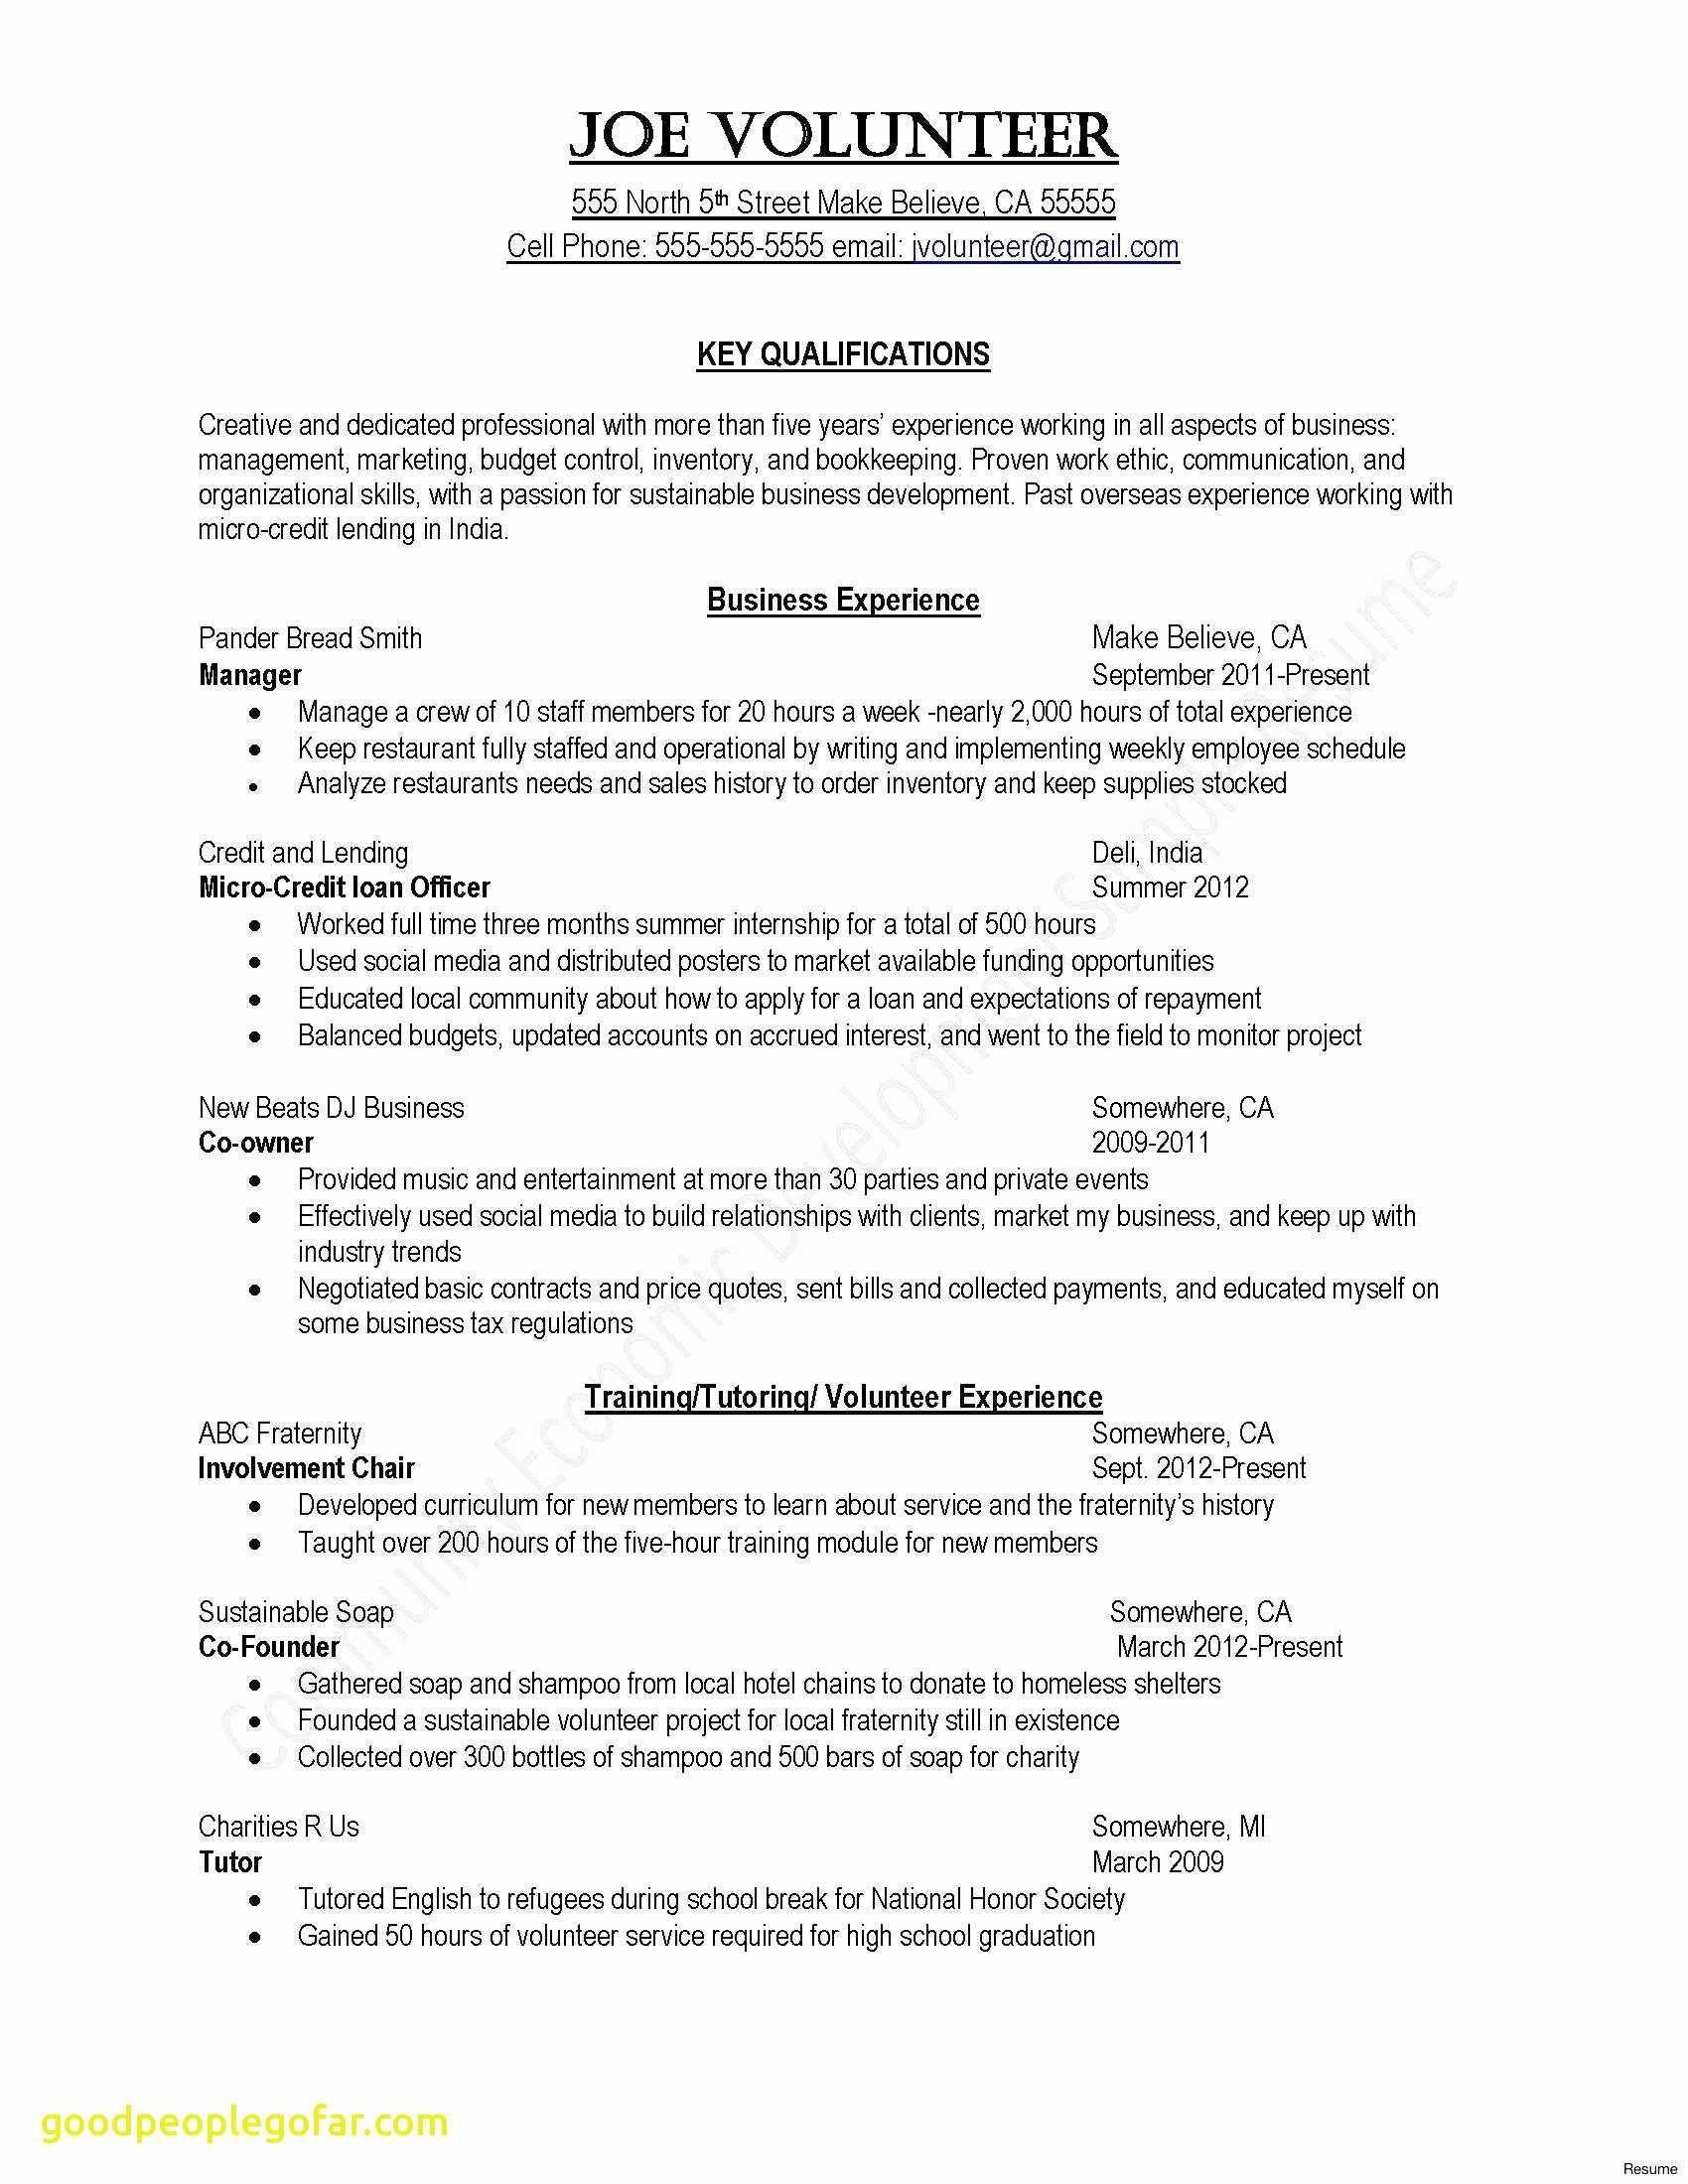 Employment Verification Letter Template - Sample Job Verification Letter Valid Best Sample College